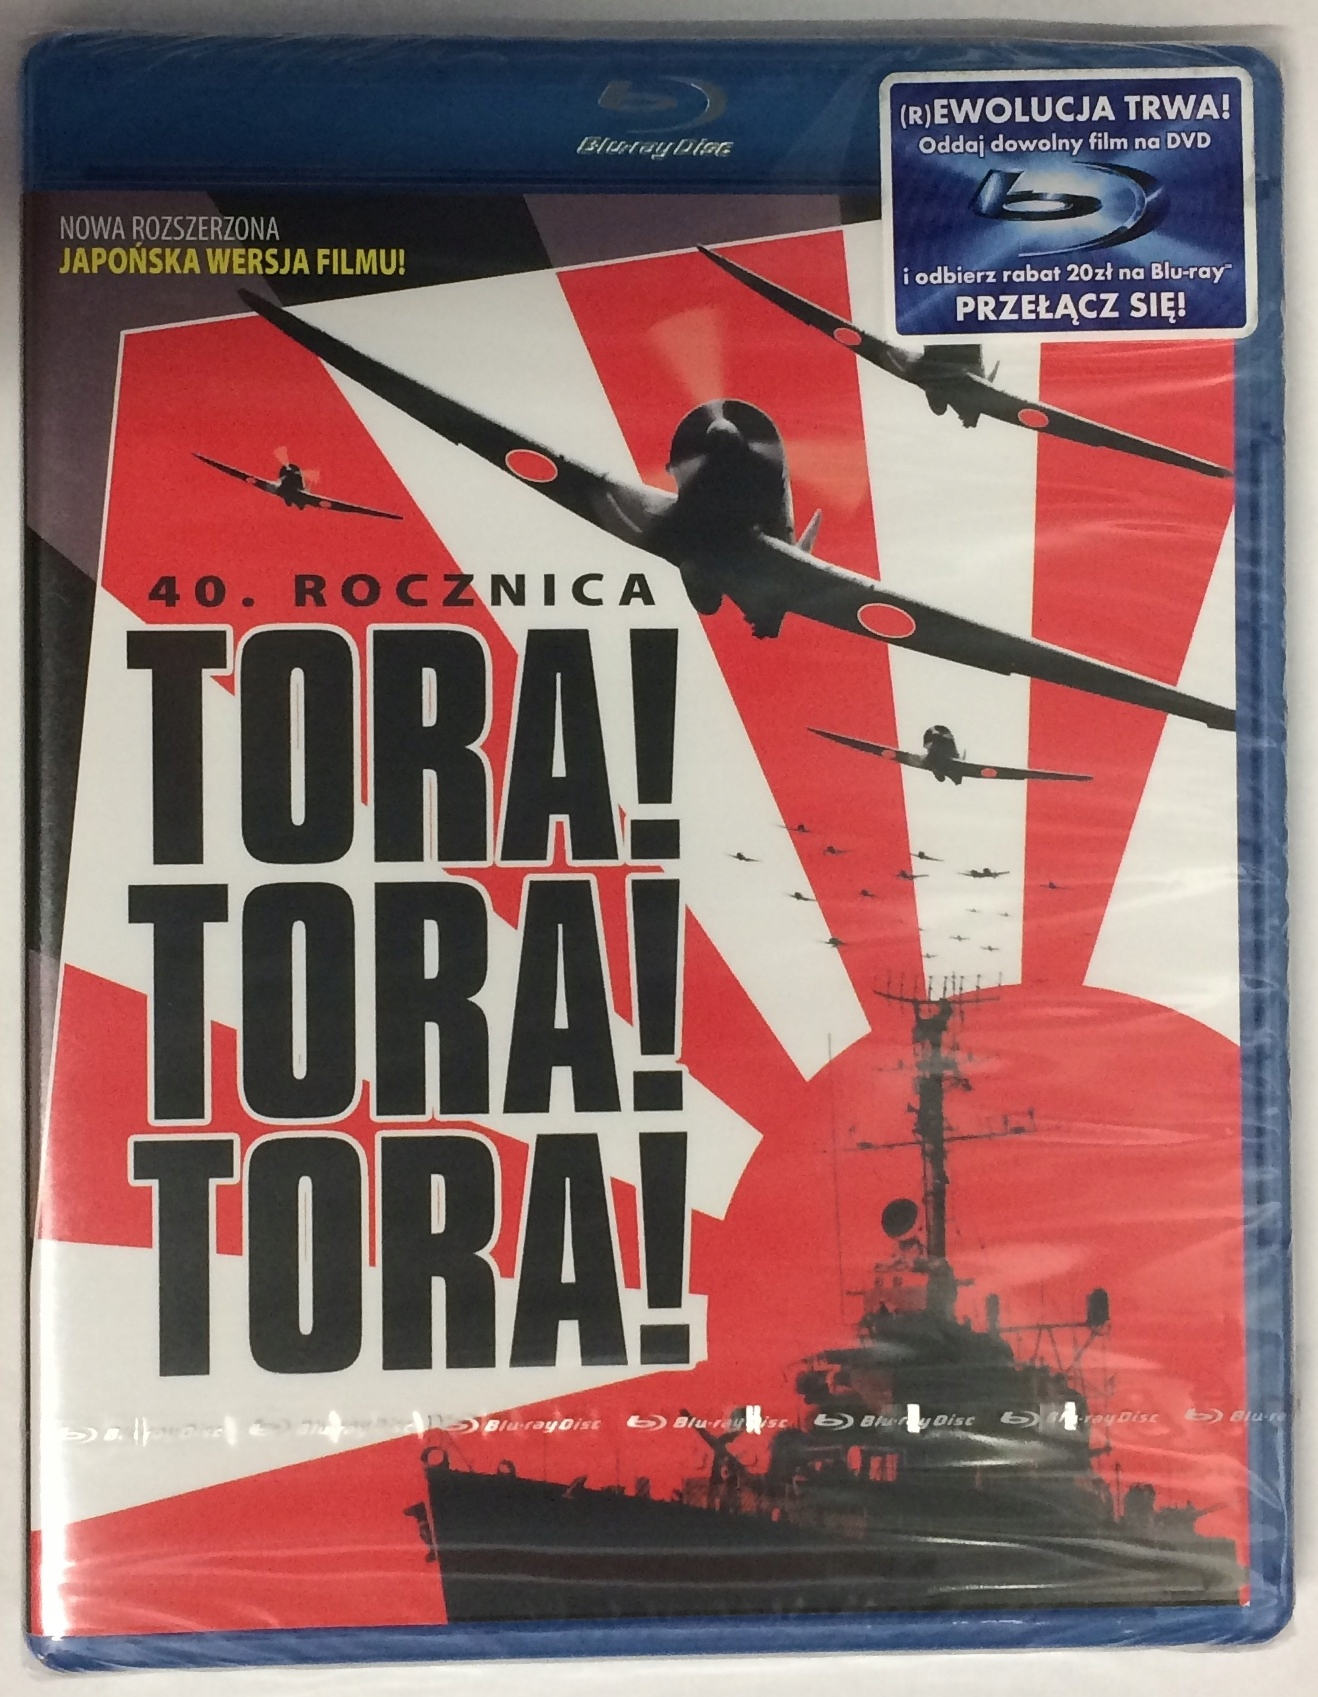 TORA! TORA! TORA! - 40. ROCZNICA [Blu-ray]